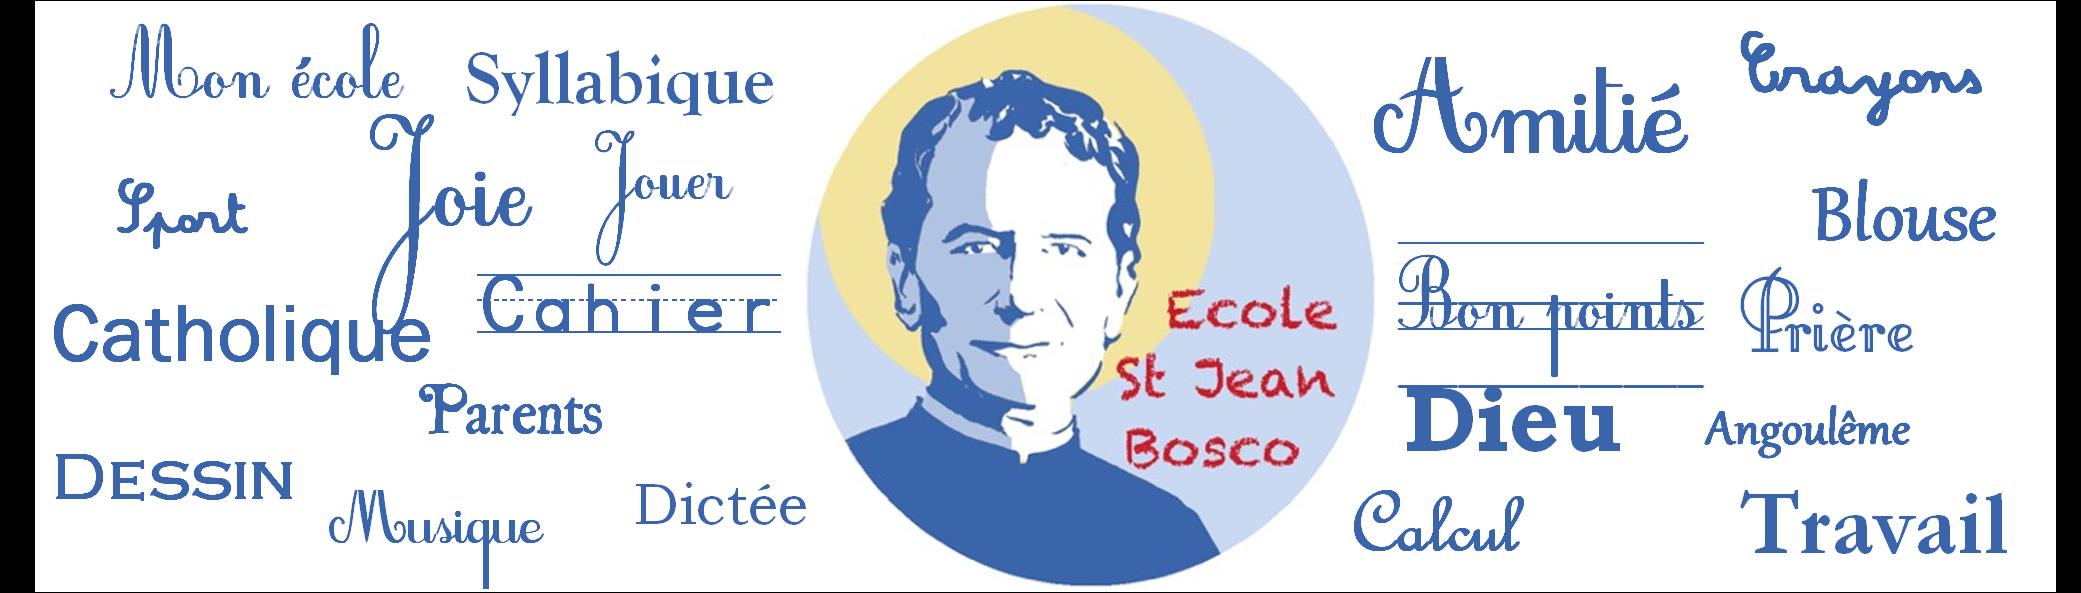 Ecole Saint Jean Bosco